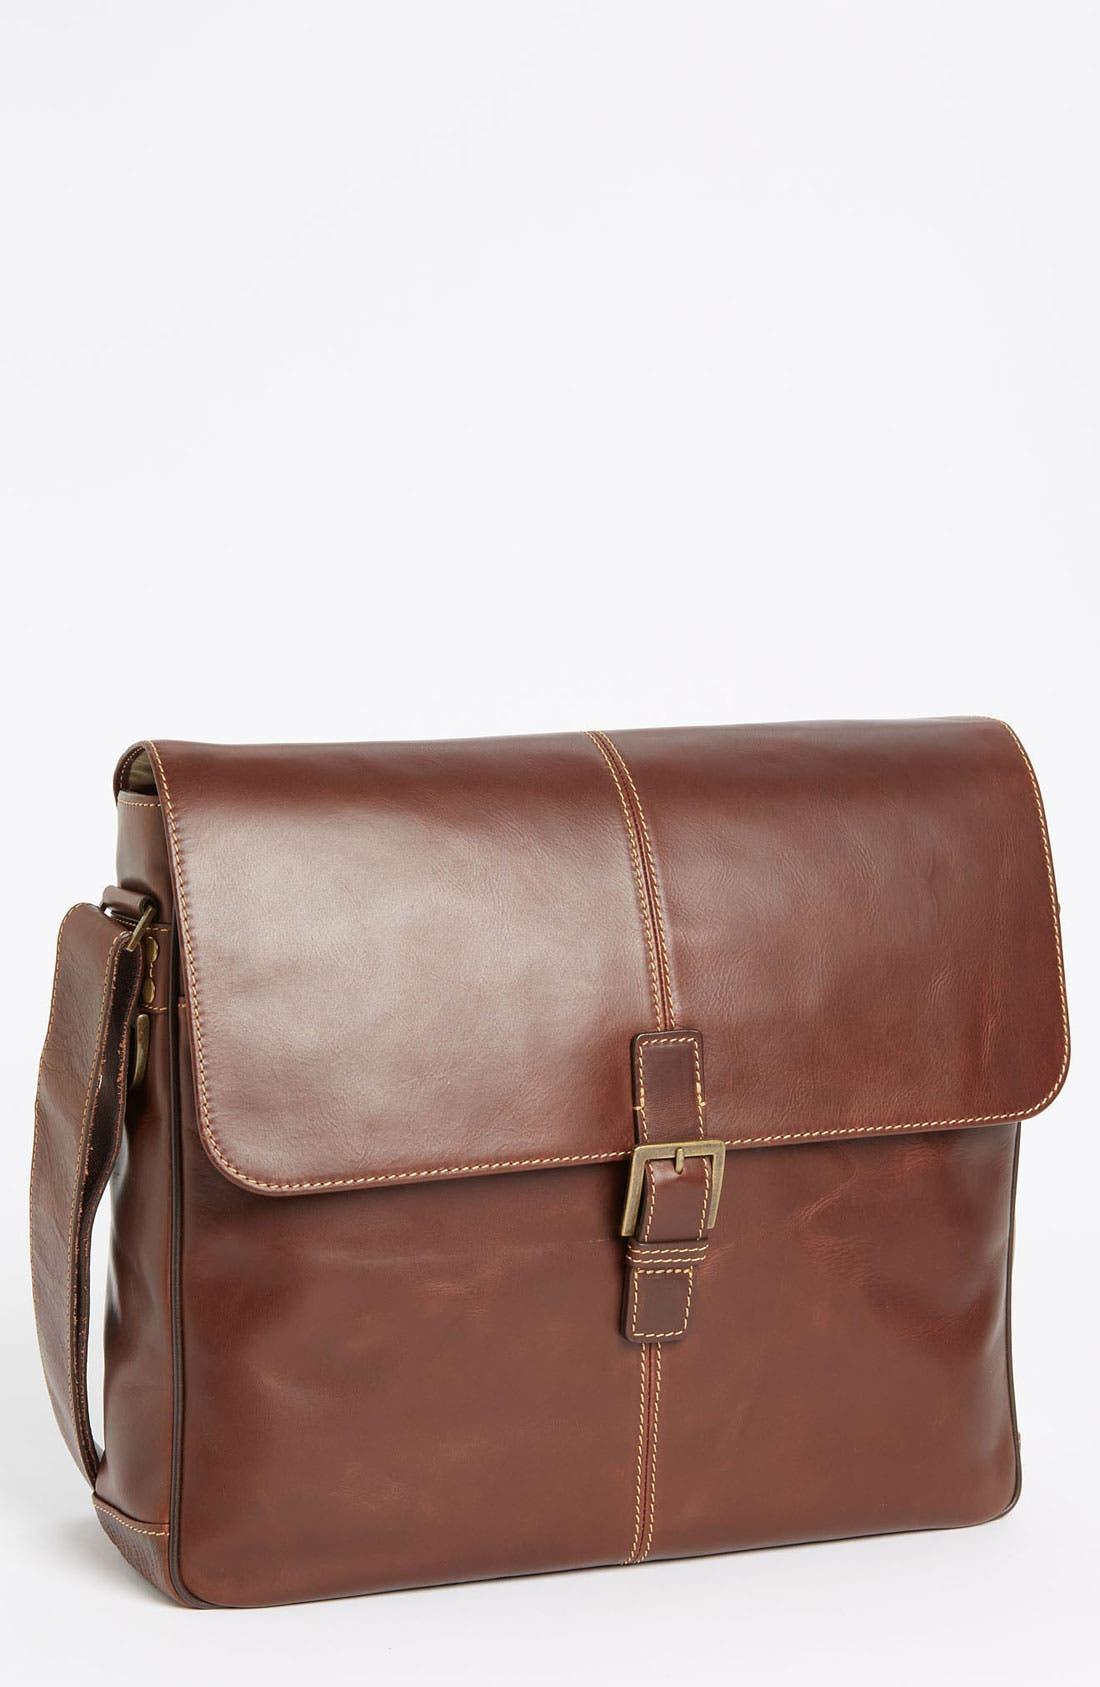 'Bryant' Messenger Bag, Main, color, 241